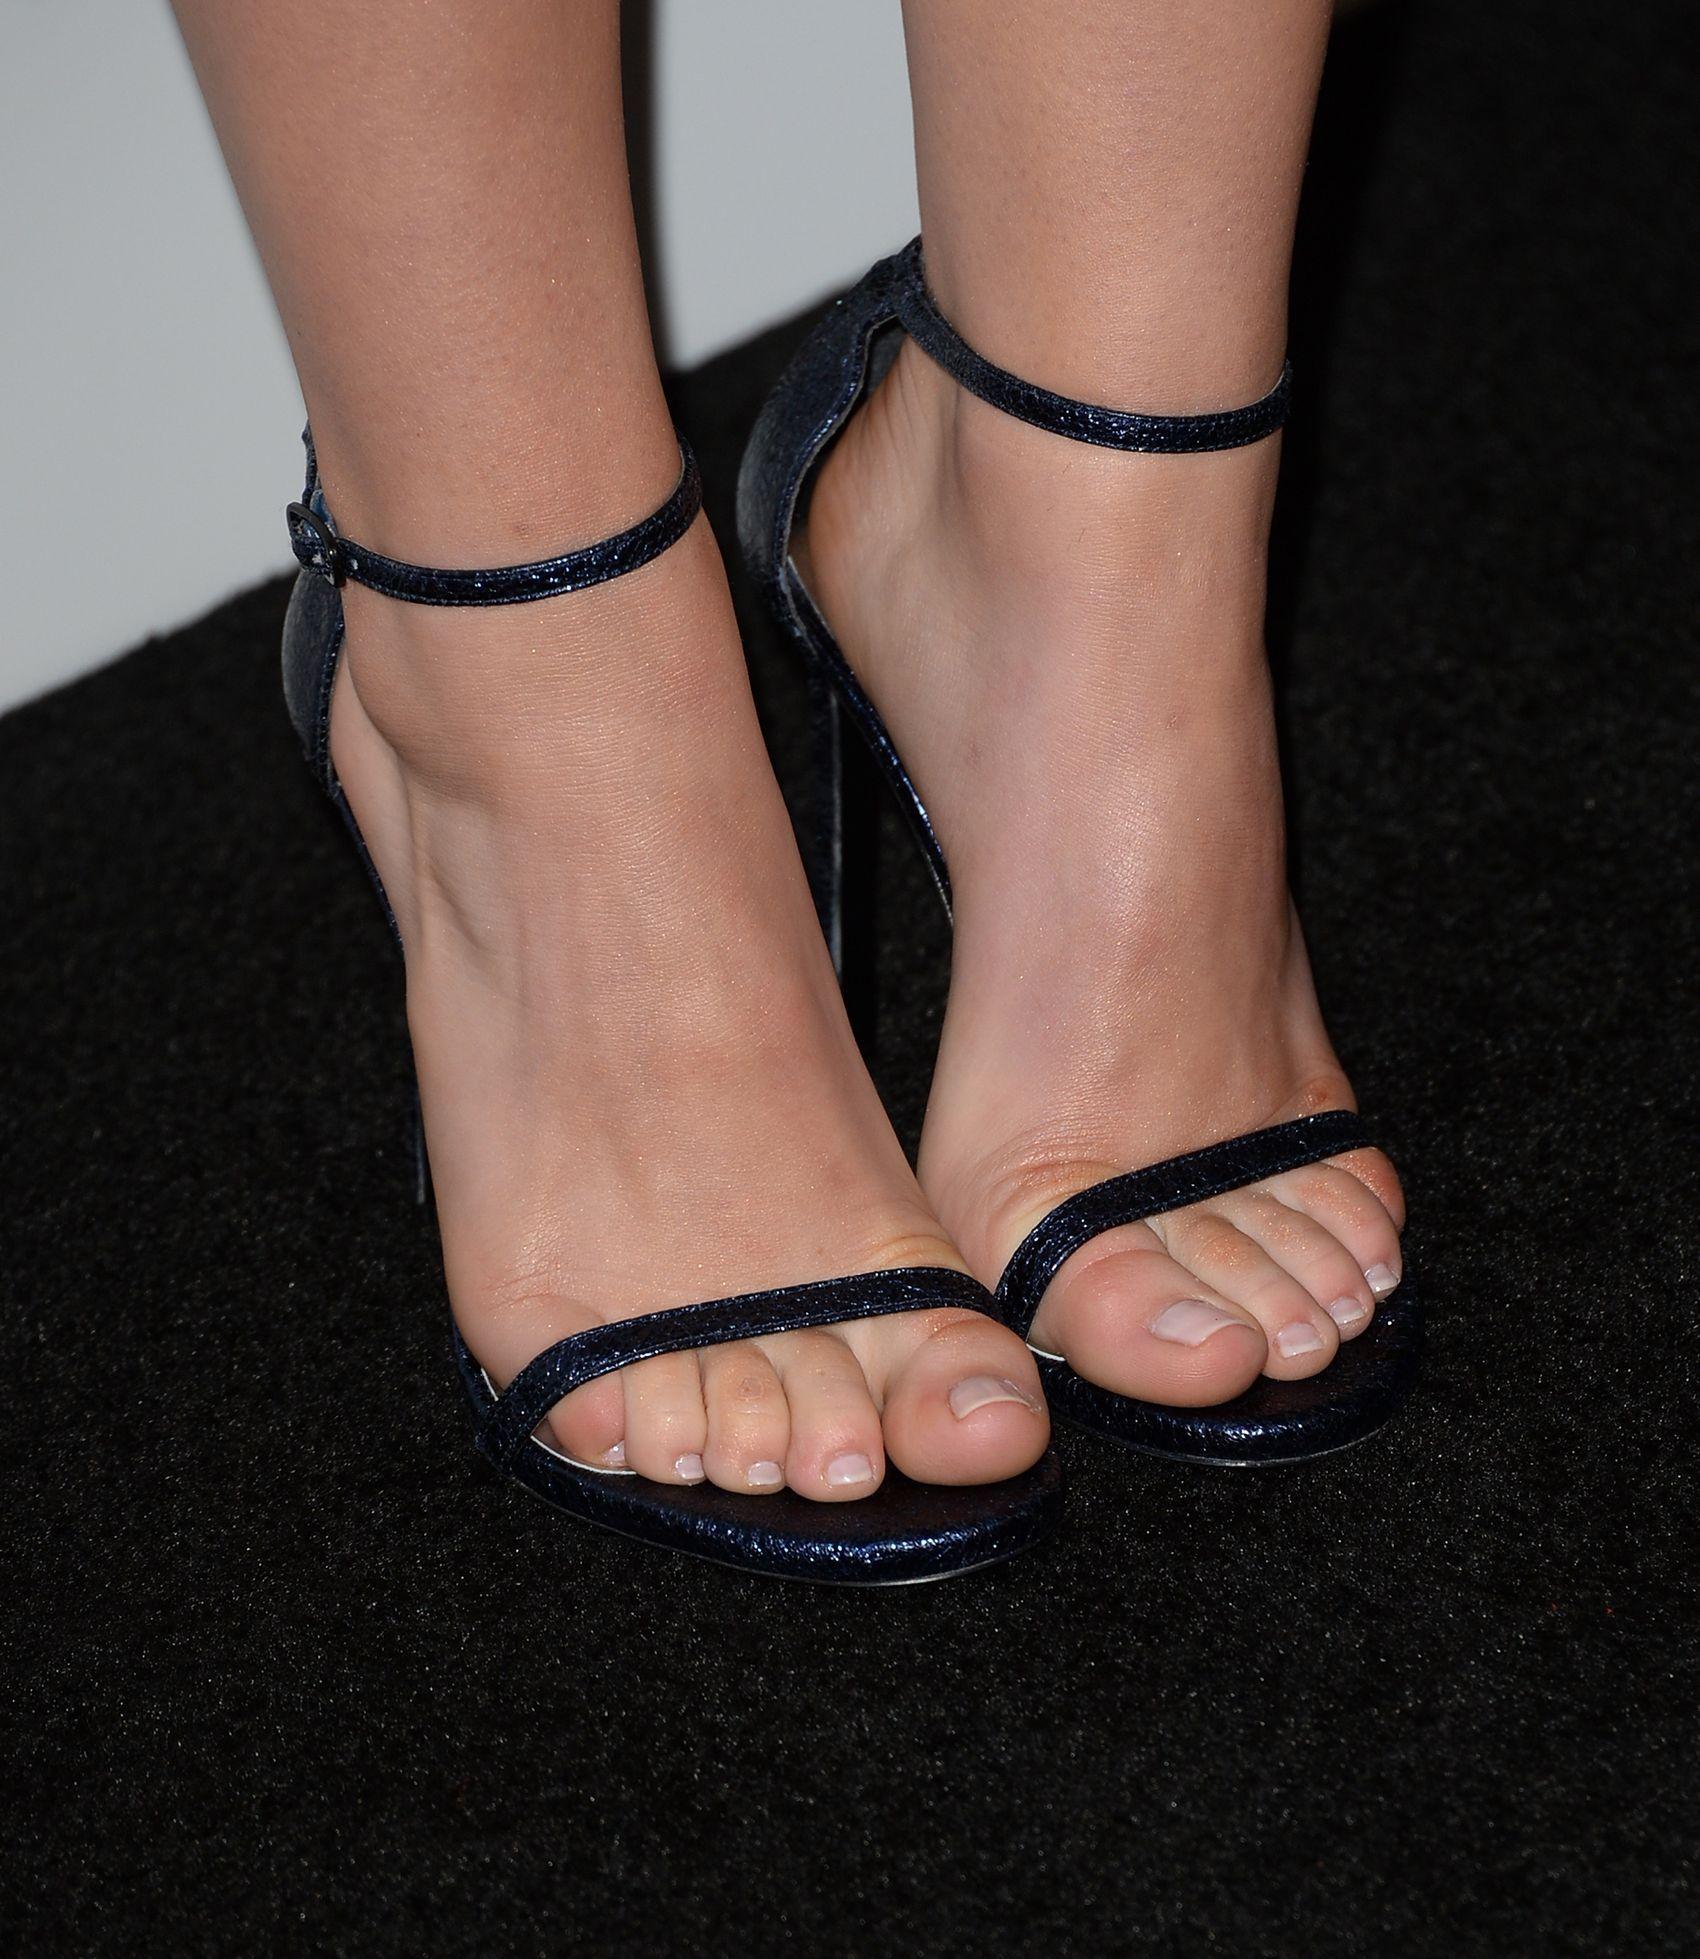 Kiernan Shipka Celeb Feet Topuklular Topuklu